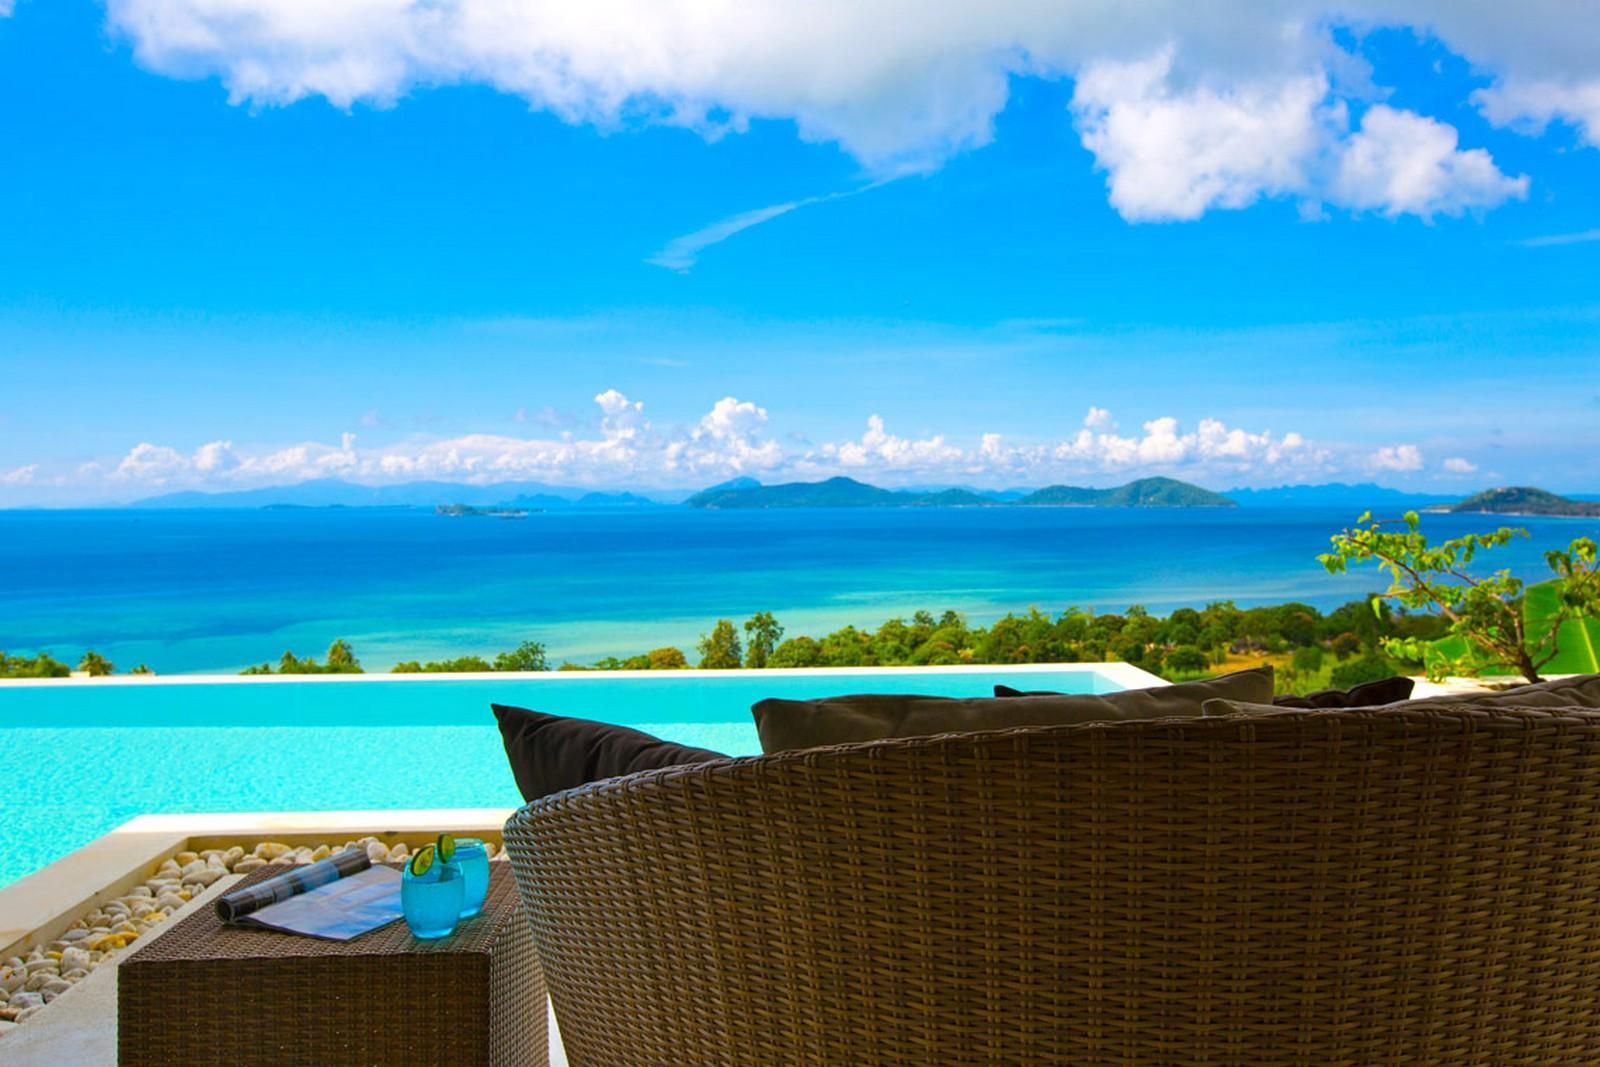 Villa Camille rental – 4 Bedrooms in Villas Laem Set, Villas Koh ...